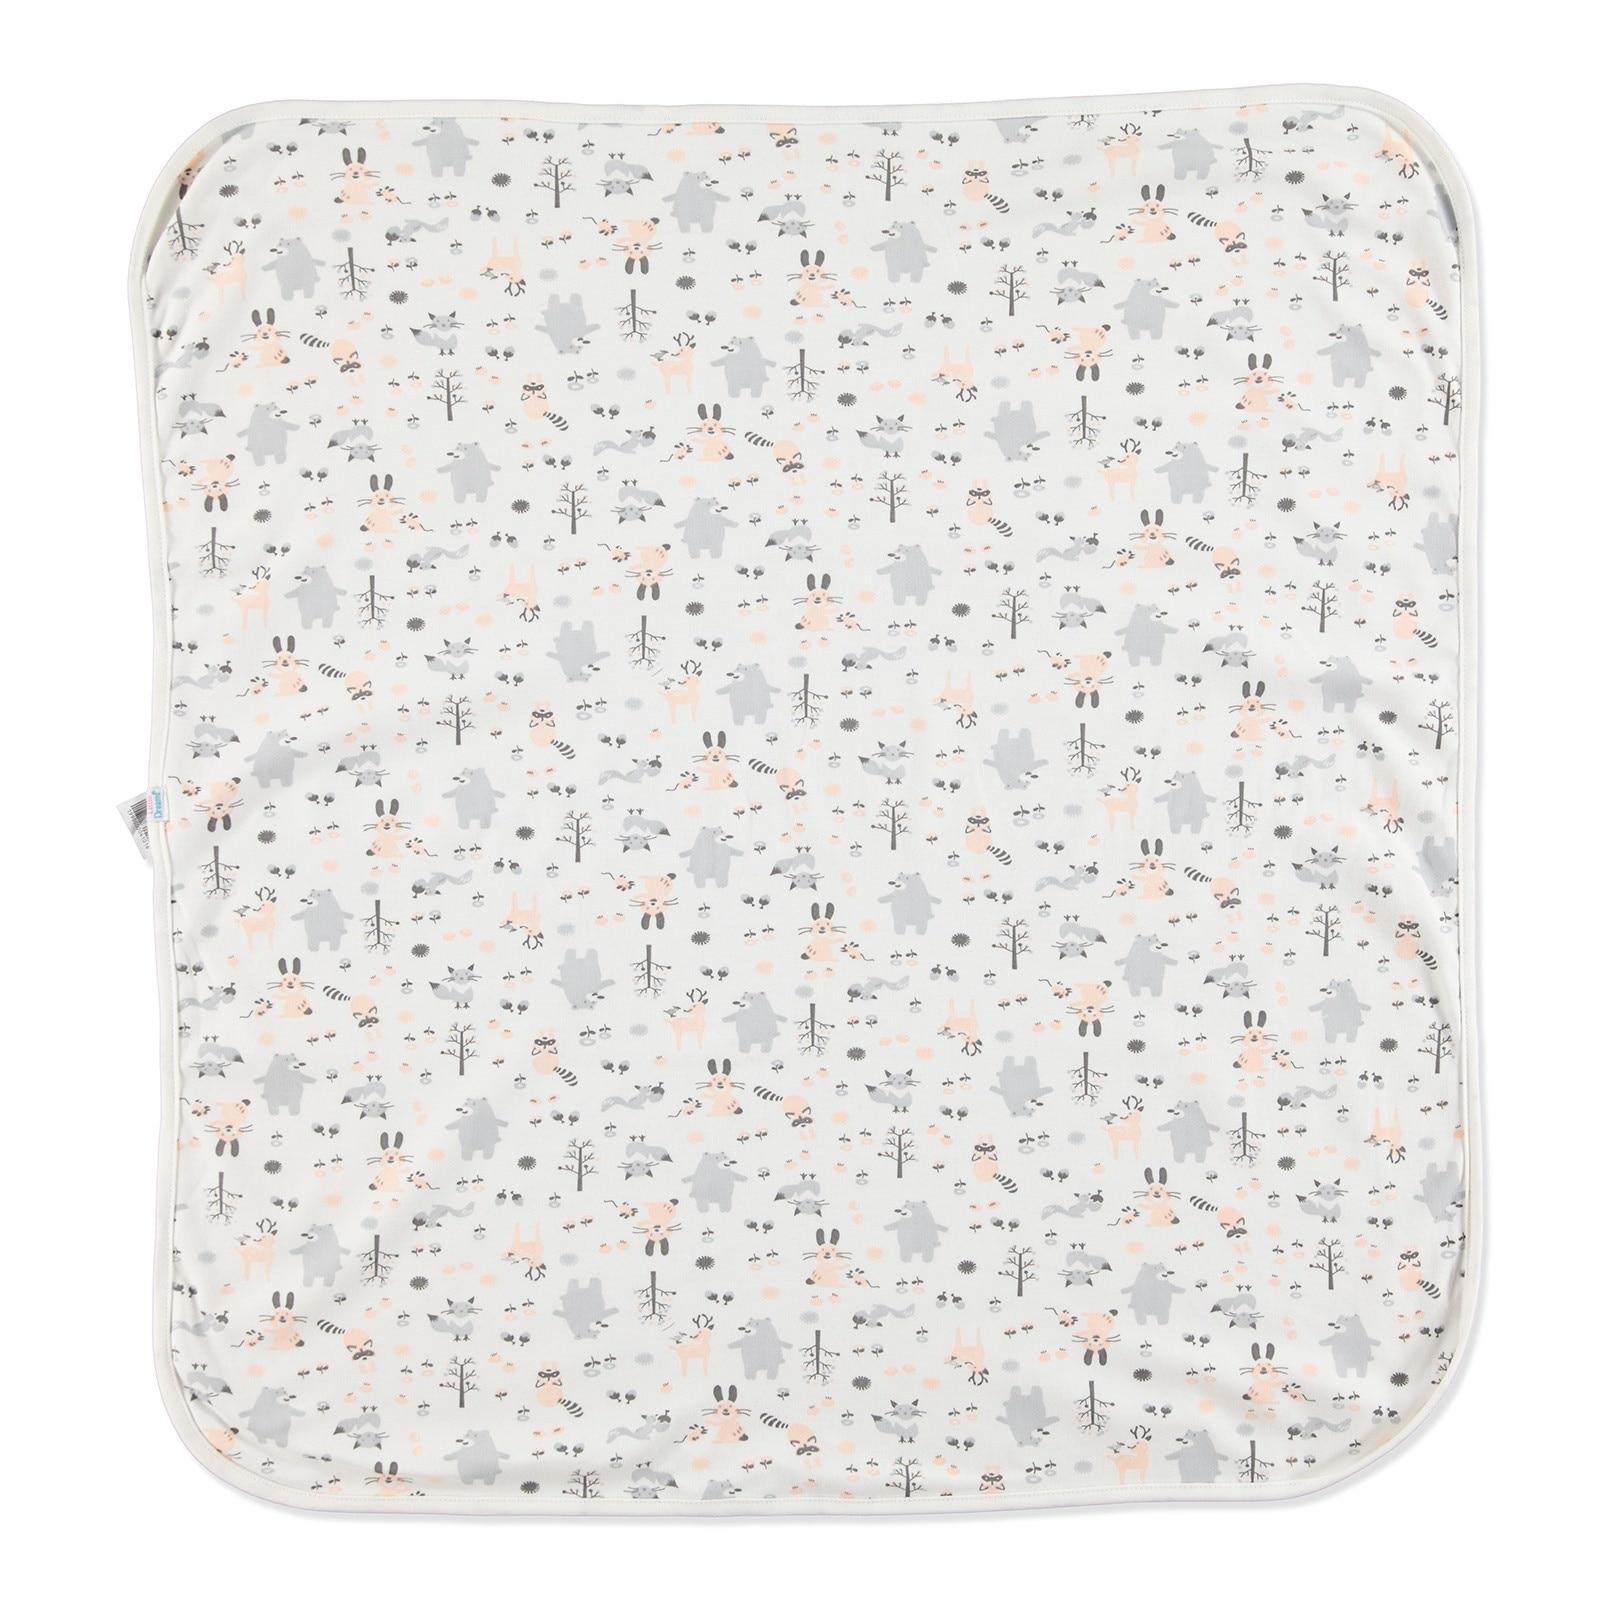 Ebebek Little Dreams Forest Patterned Multipurpose Baby Blanket